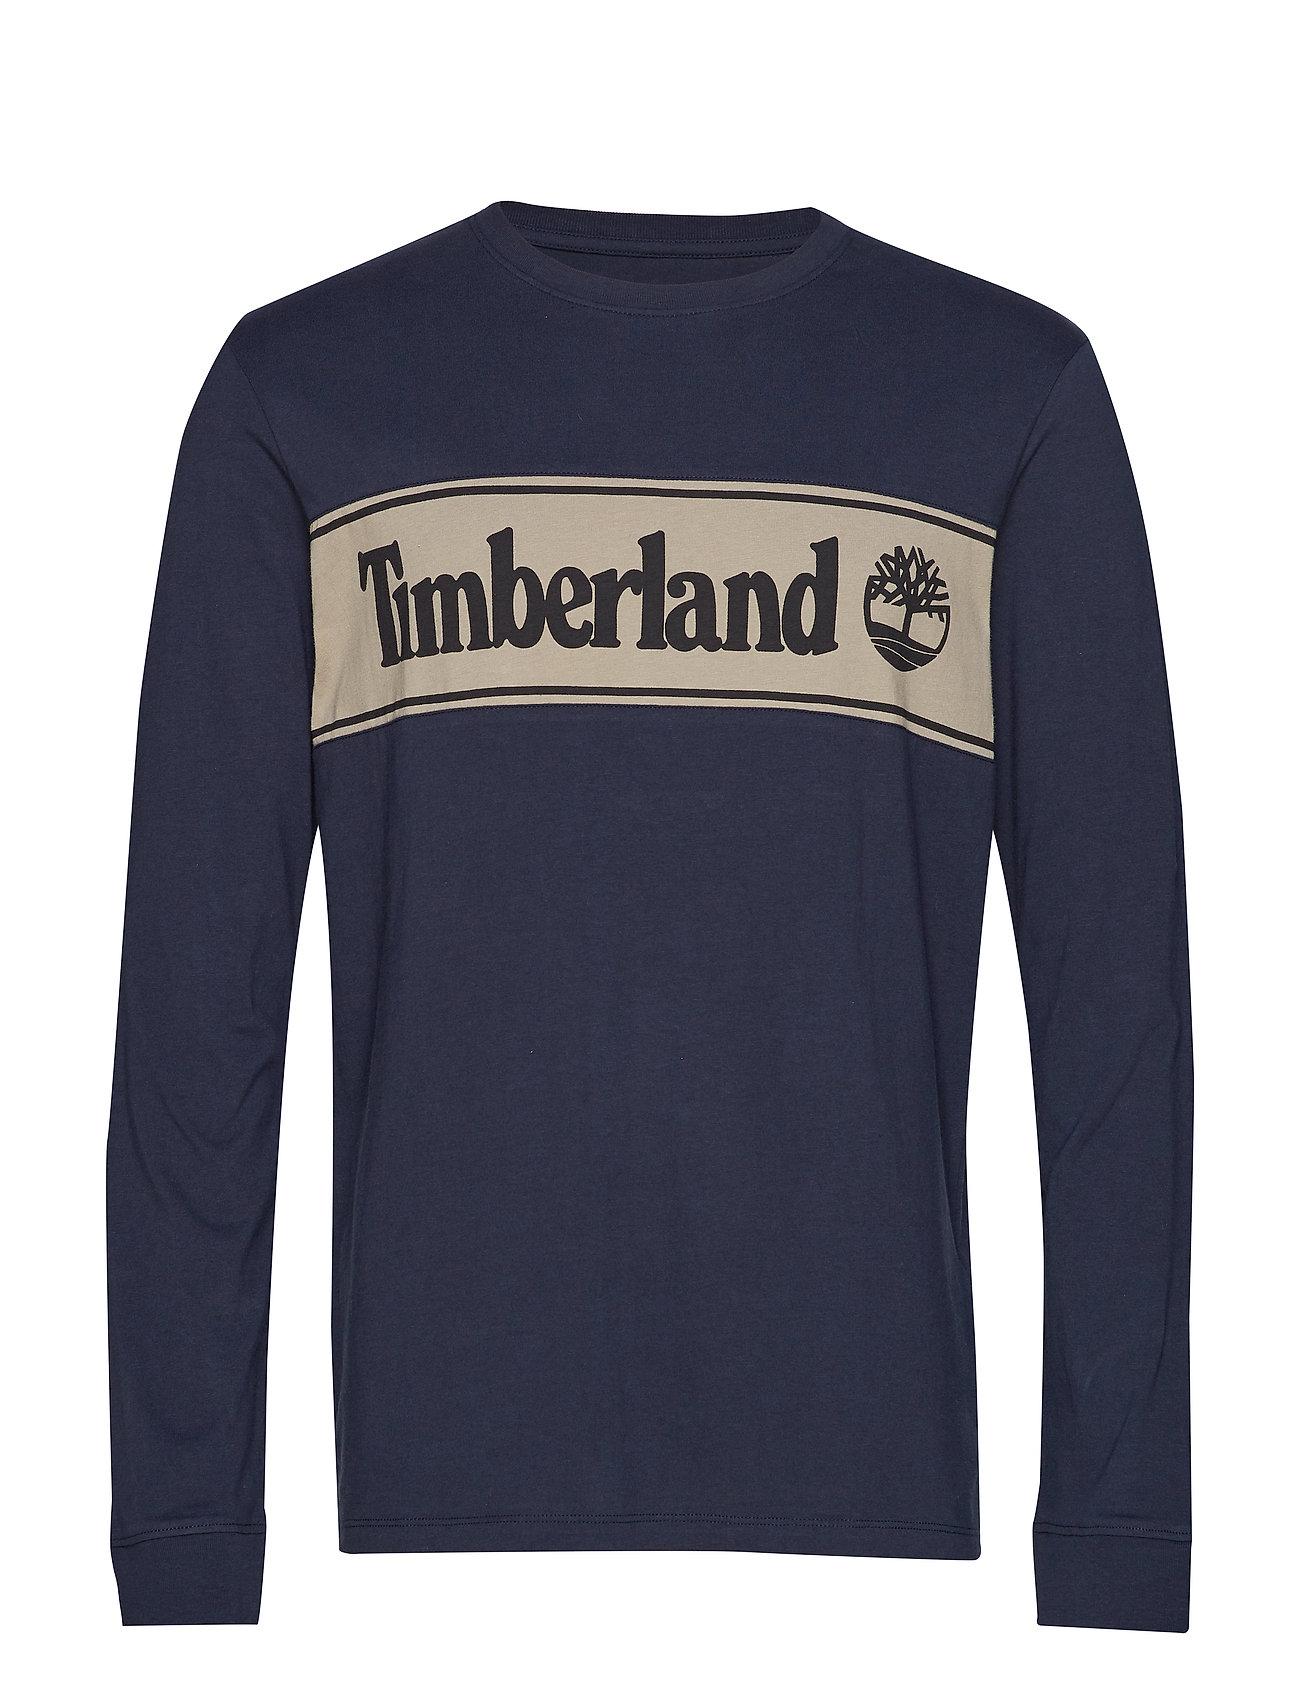 Timberland SS Cut & Sew Linear Logo Tee - DK SAPPHIRE/ELEPHANT SKIN